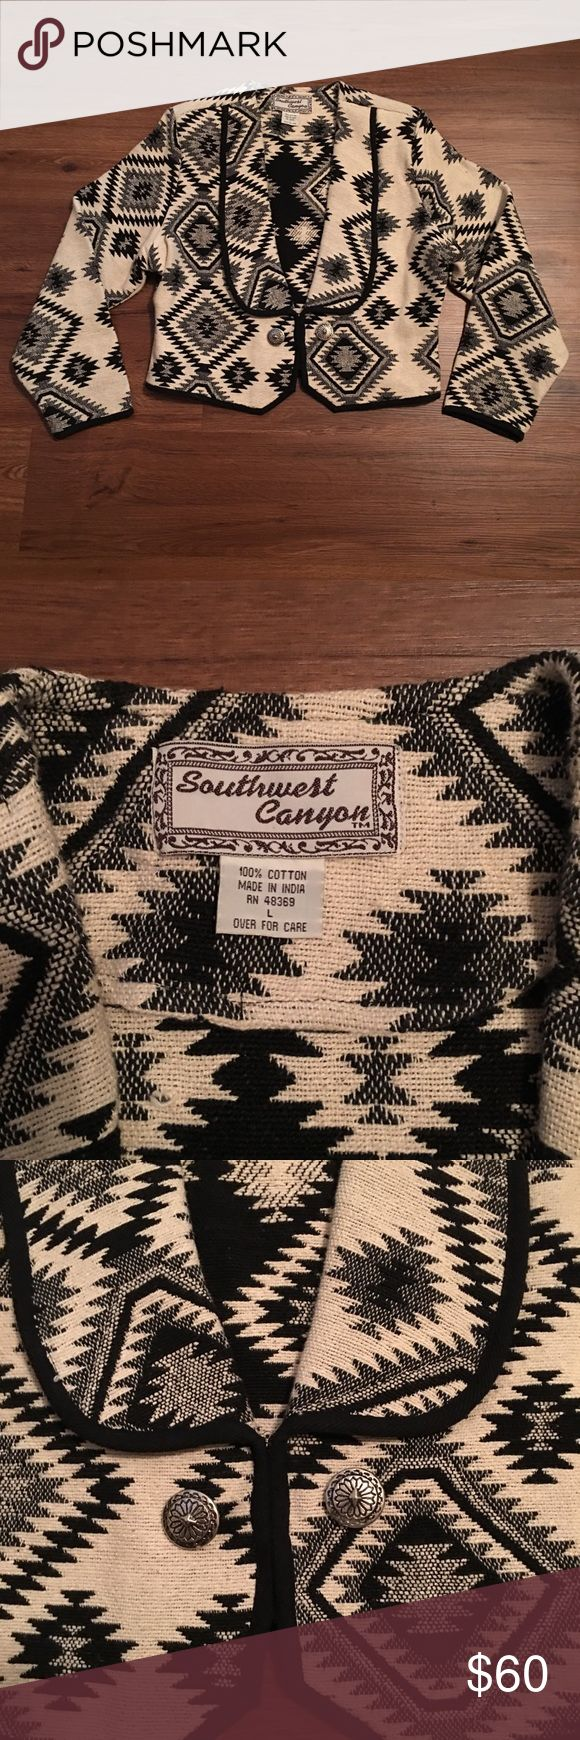 Vintage Southwest Canyon Jacket Size Large  100% Cotton   RN# 48369  A couple stray strands but still looks amazing and great quality! Southwest Canyon Jackets & Coats Blazers